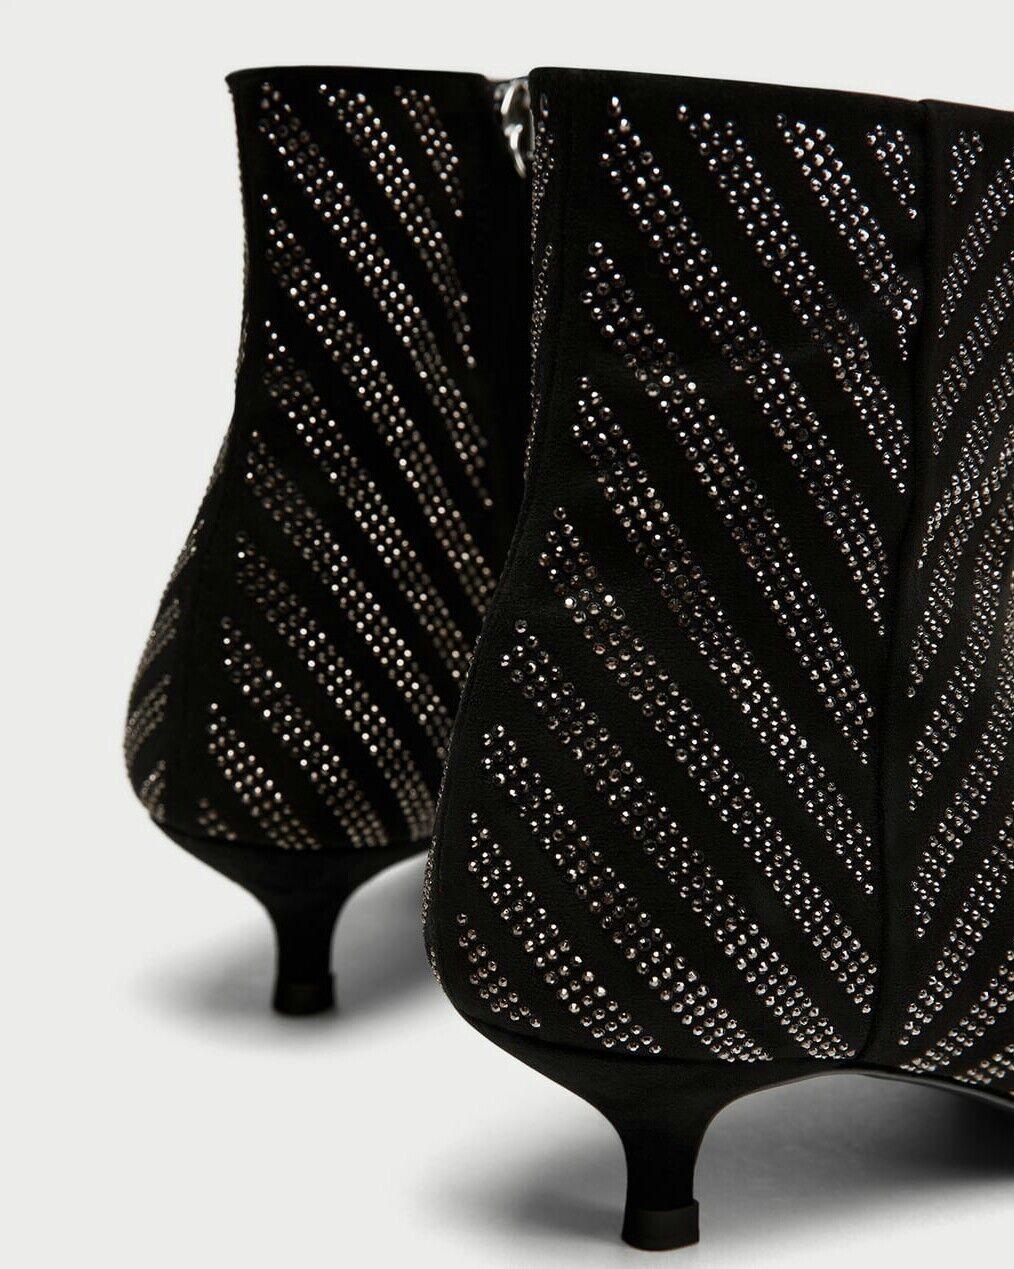 Zara schwarz with glitter UK detail ankle Stiefel 39 UK glitter 6 4a073e